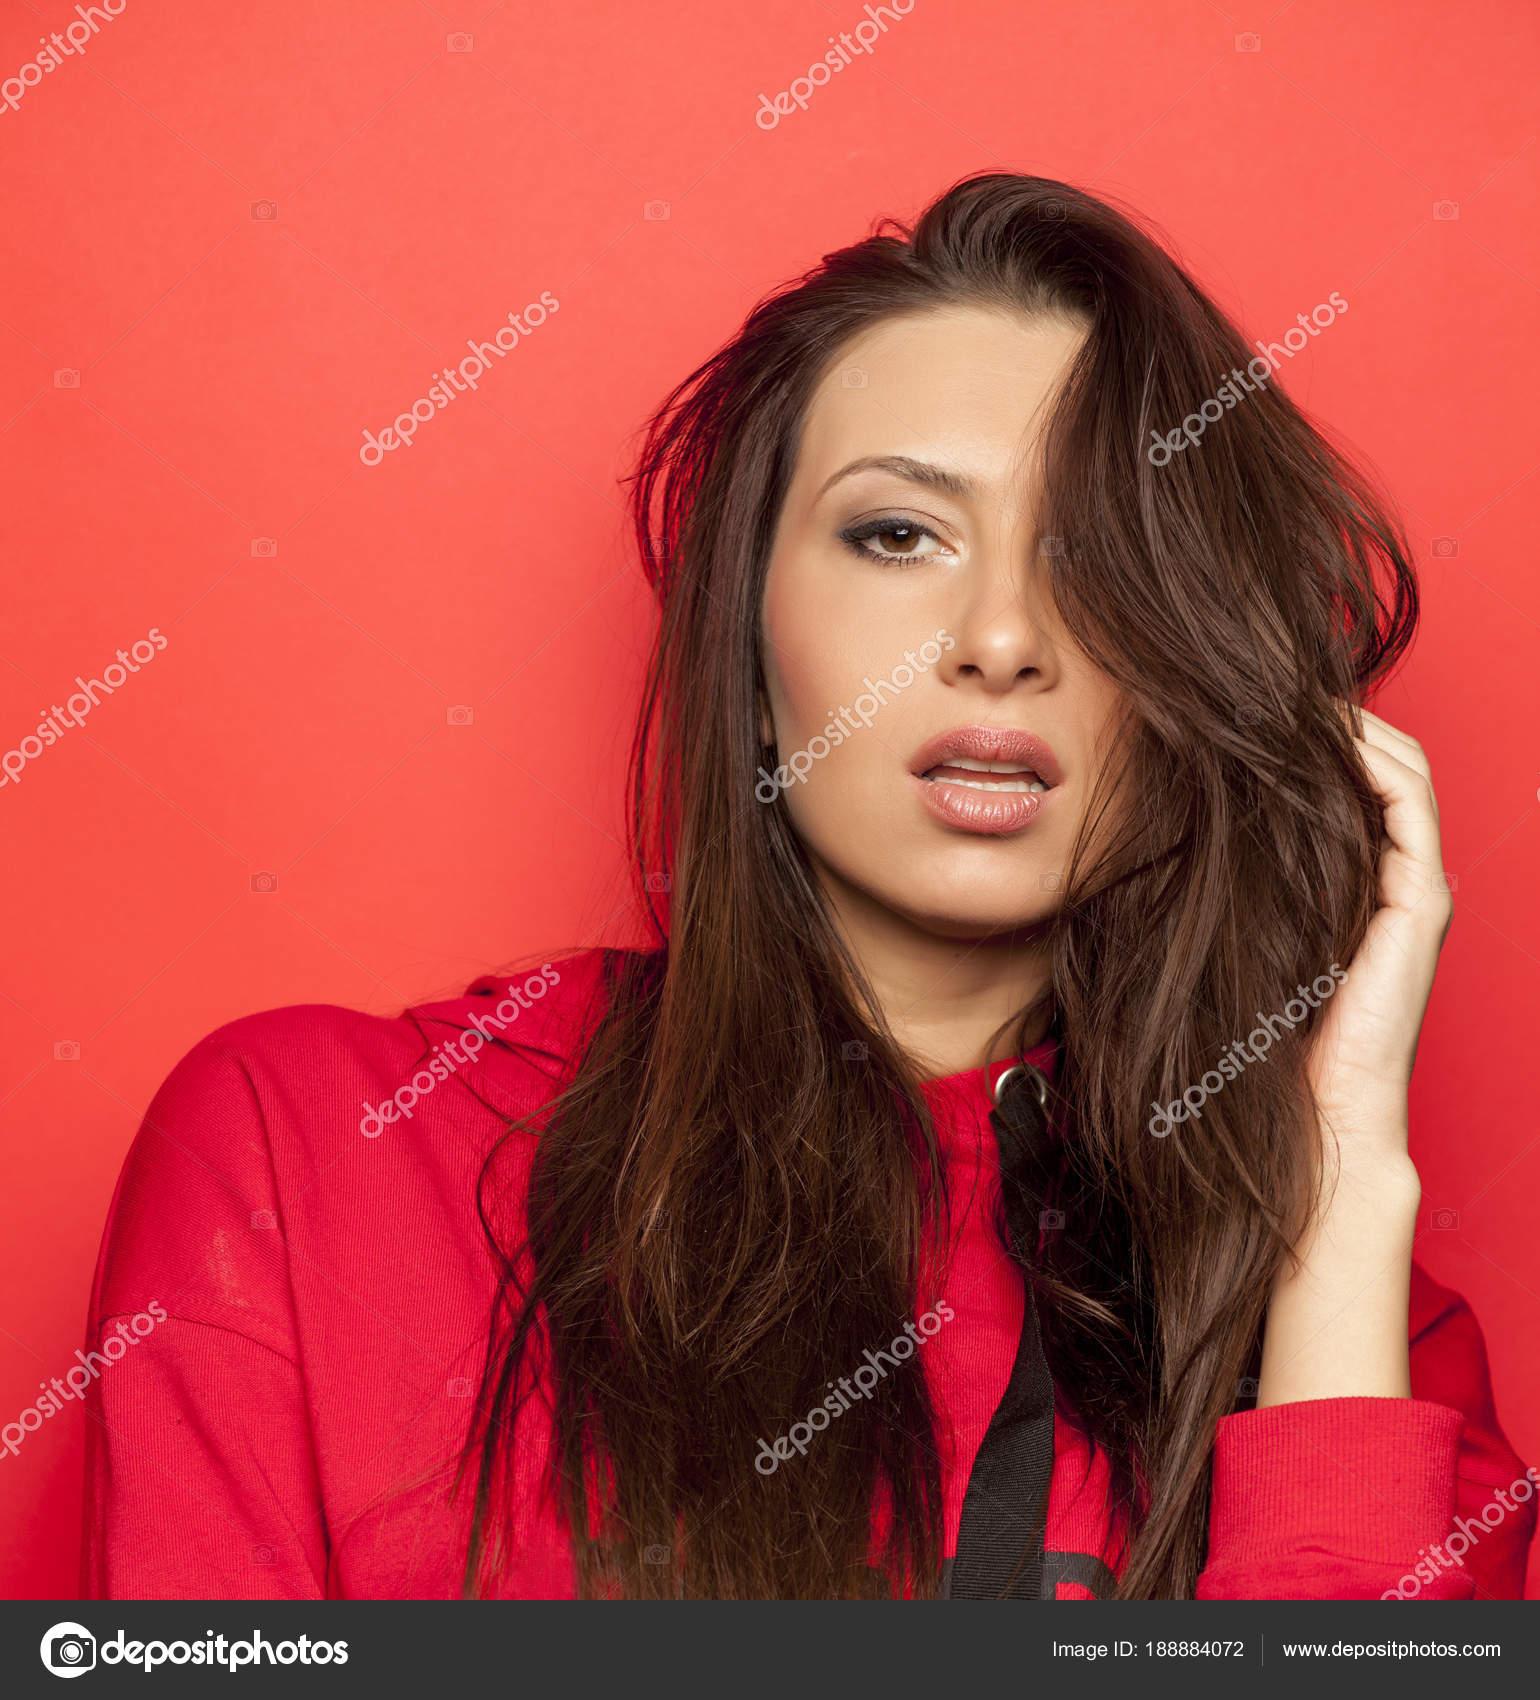 e8170ec87207 Όμορφη Σαγηνευτική Γυναίκα Κόκκινη Μπλούζα Κόκκινο Φόντο — Φωτογραφία  Αρχείου